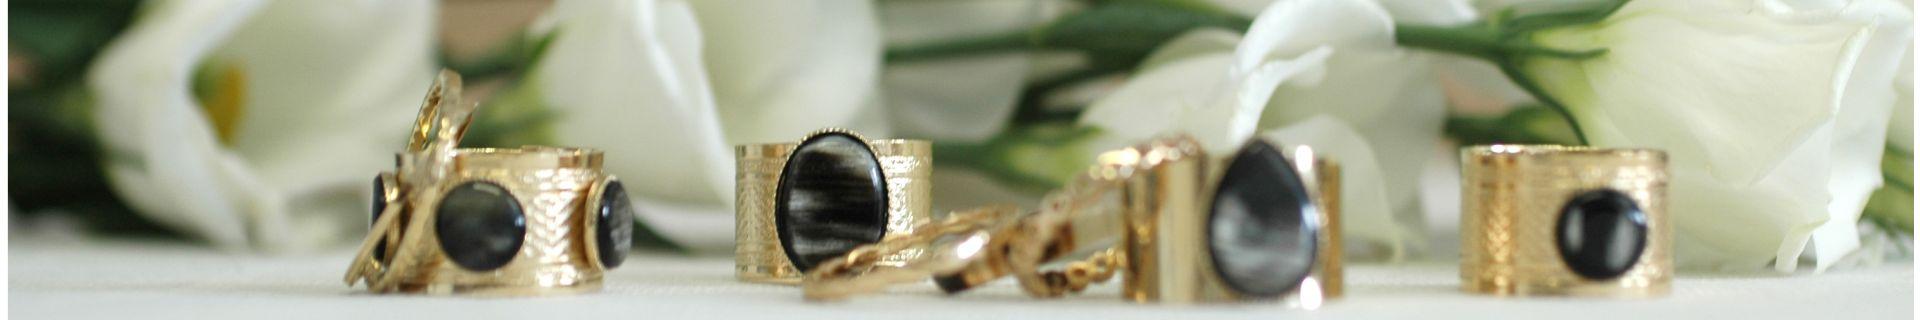 Bijoux en plaqué or et corne - Collection Essentiels